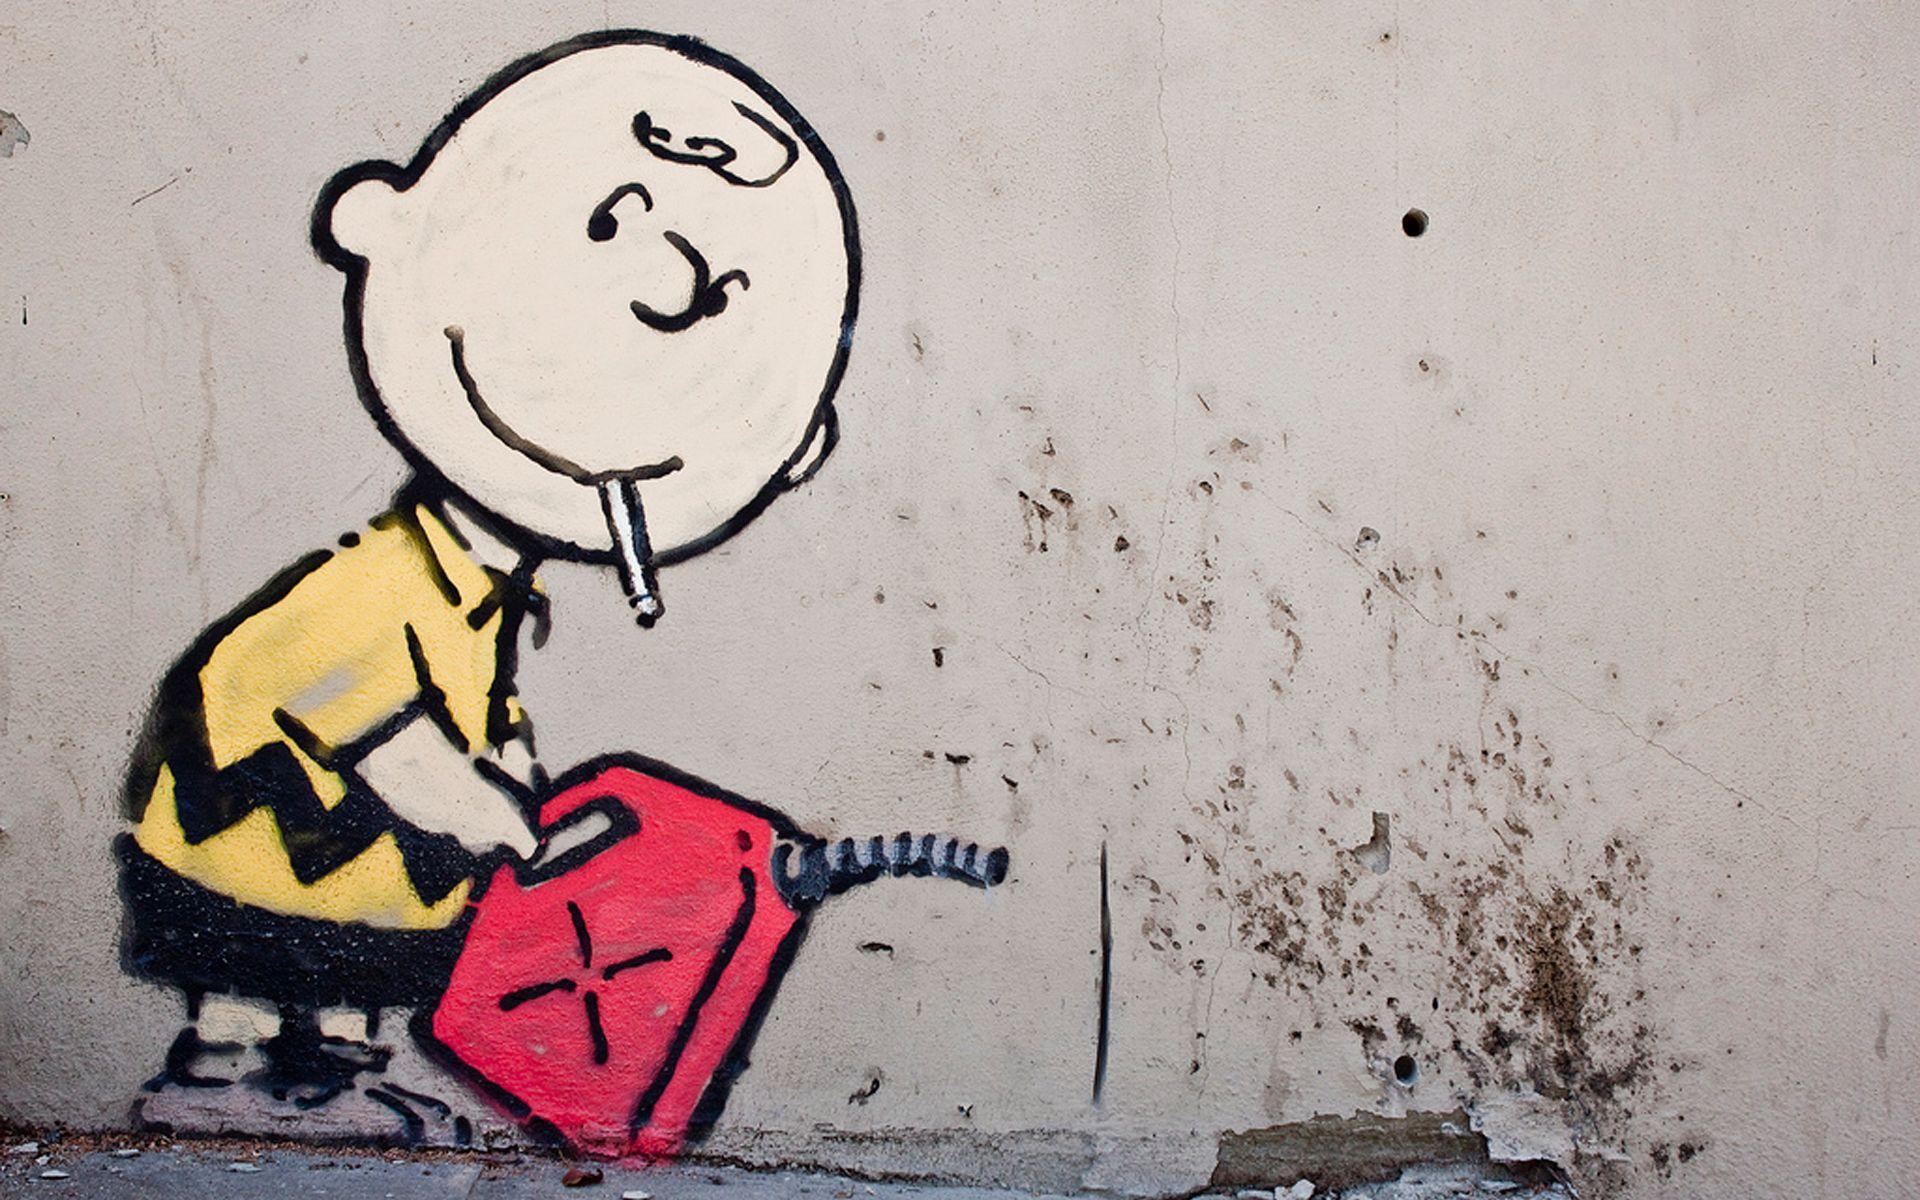 Banksy Graffiti Wallpaper Hd